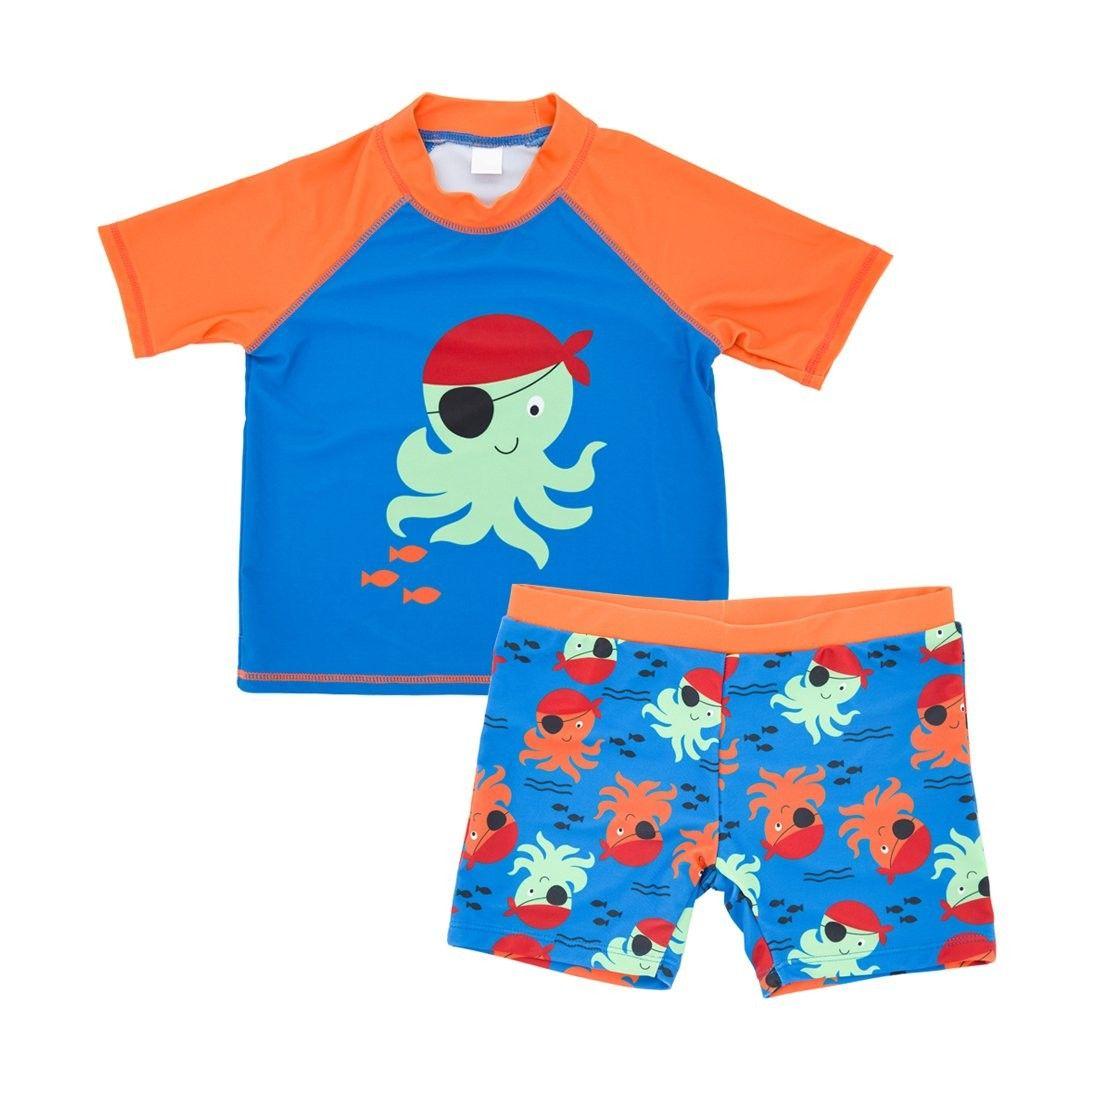 5b74d6071c Baby Toddler Boys Swim Set Kids Swimsuits Boys Two Pieces UV Protective  Swimwear Rash Guard - Octopus - CU18E4625CE - Boys' Clothing, Swim, Swimwear  Sets ...